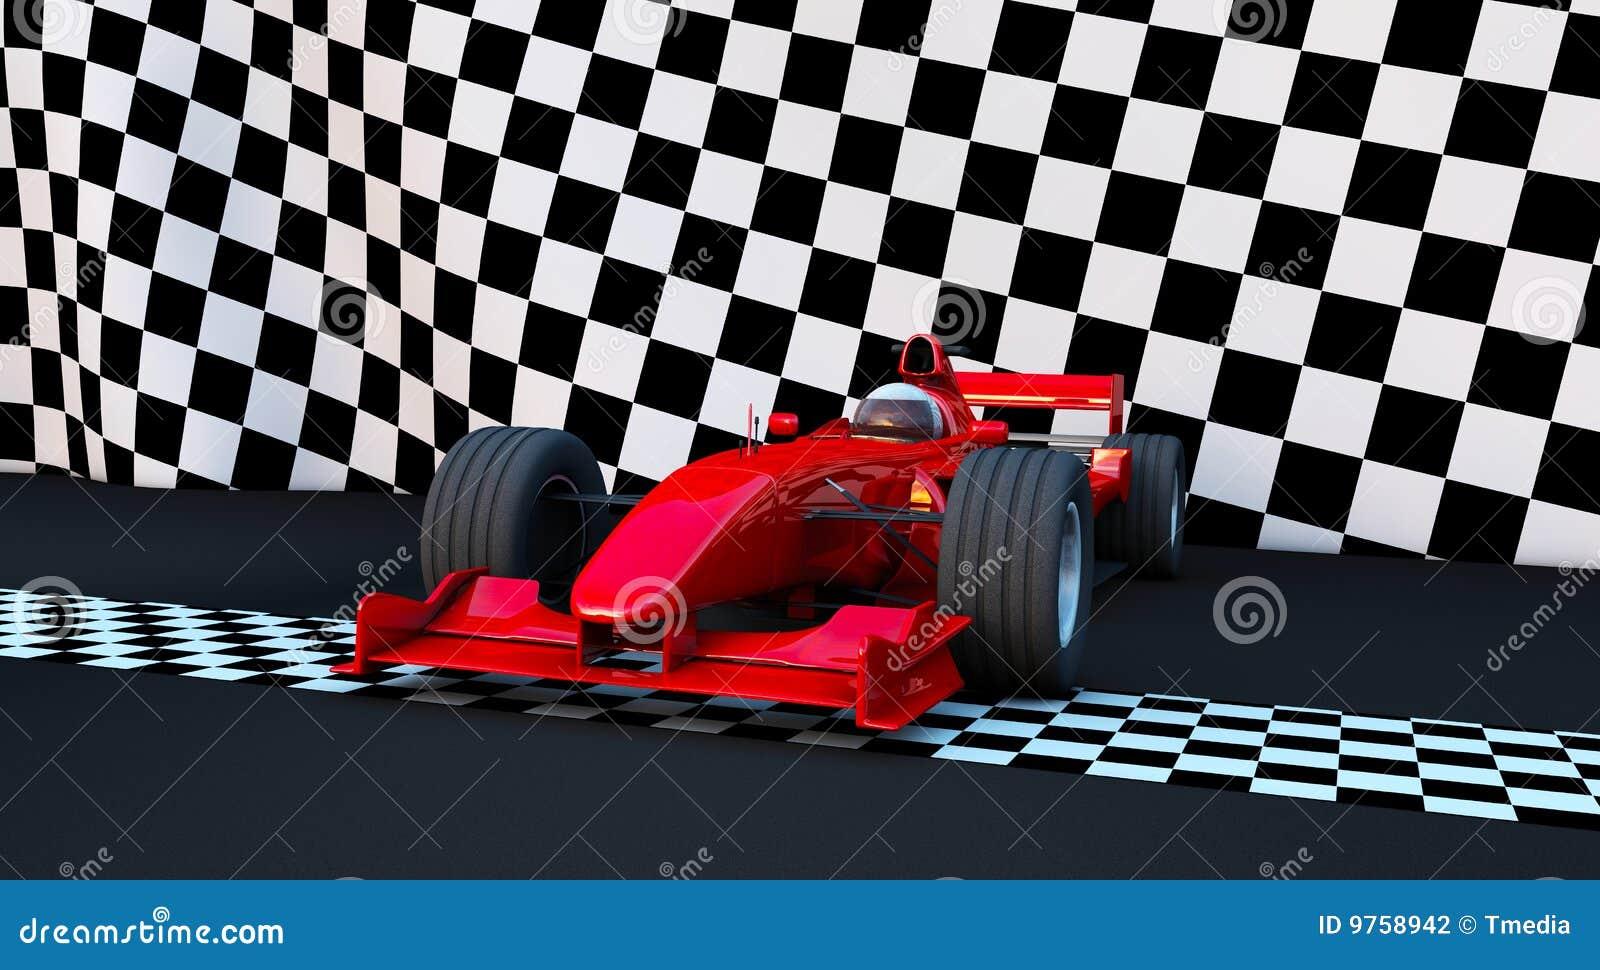 1 bilformelsport